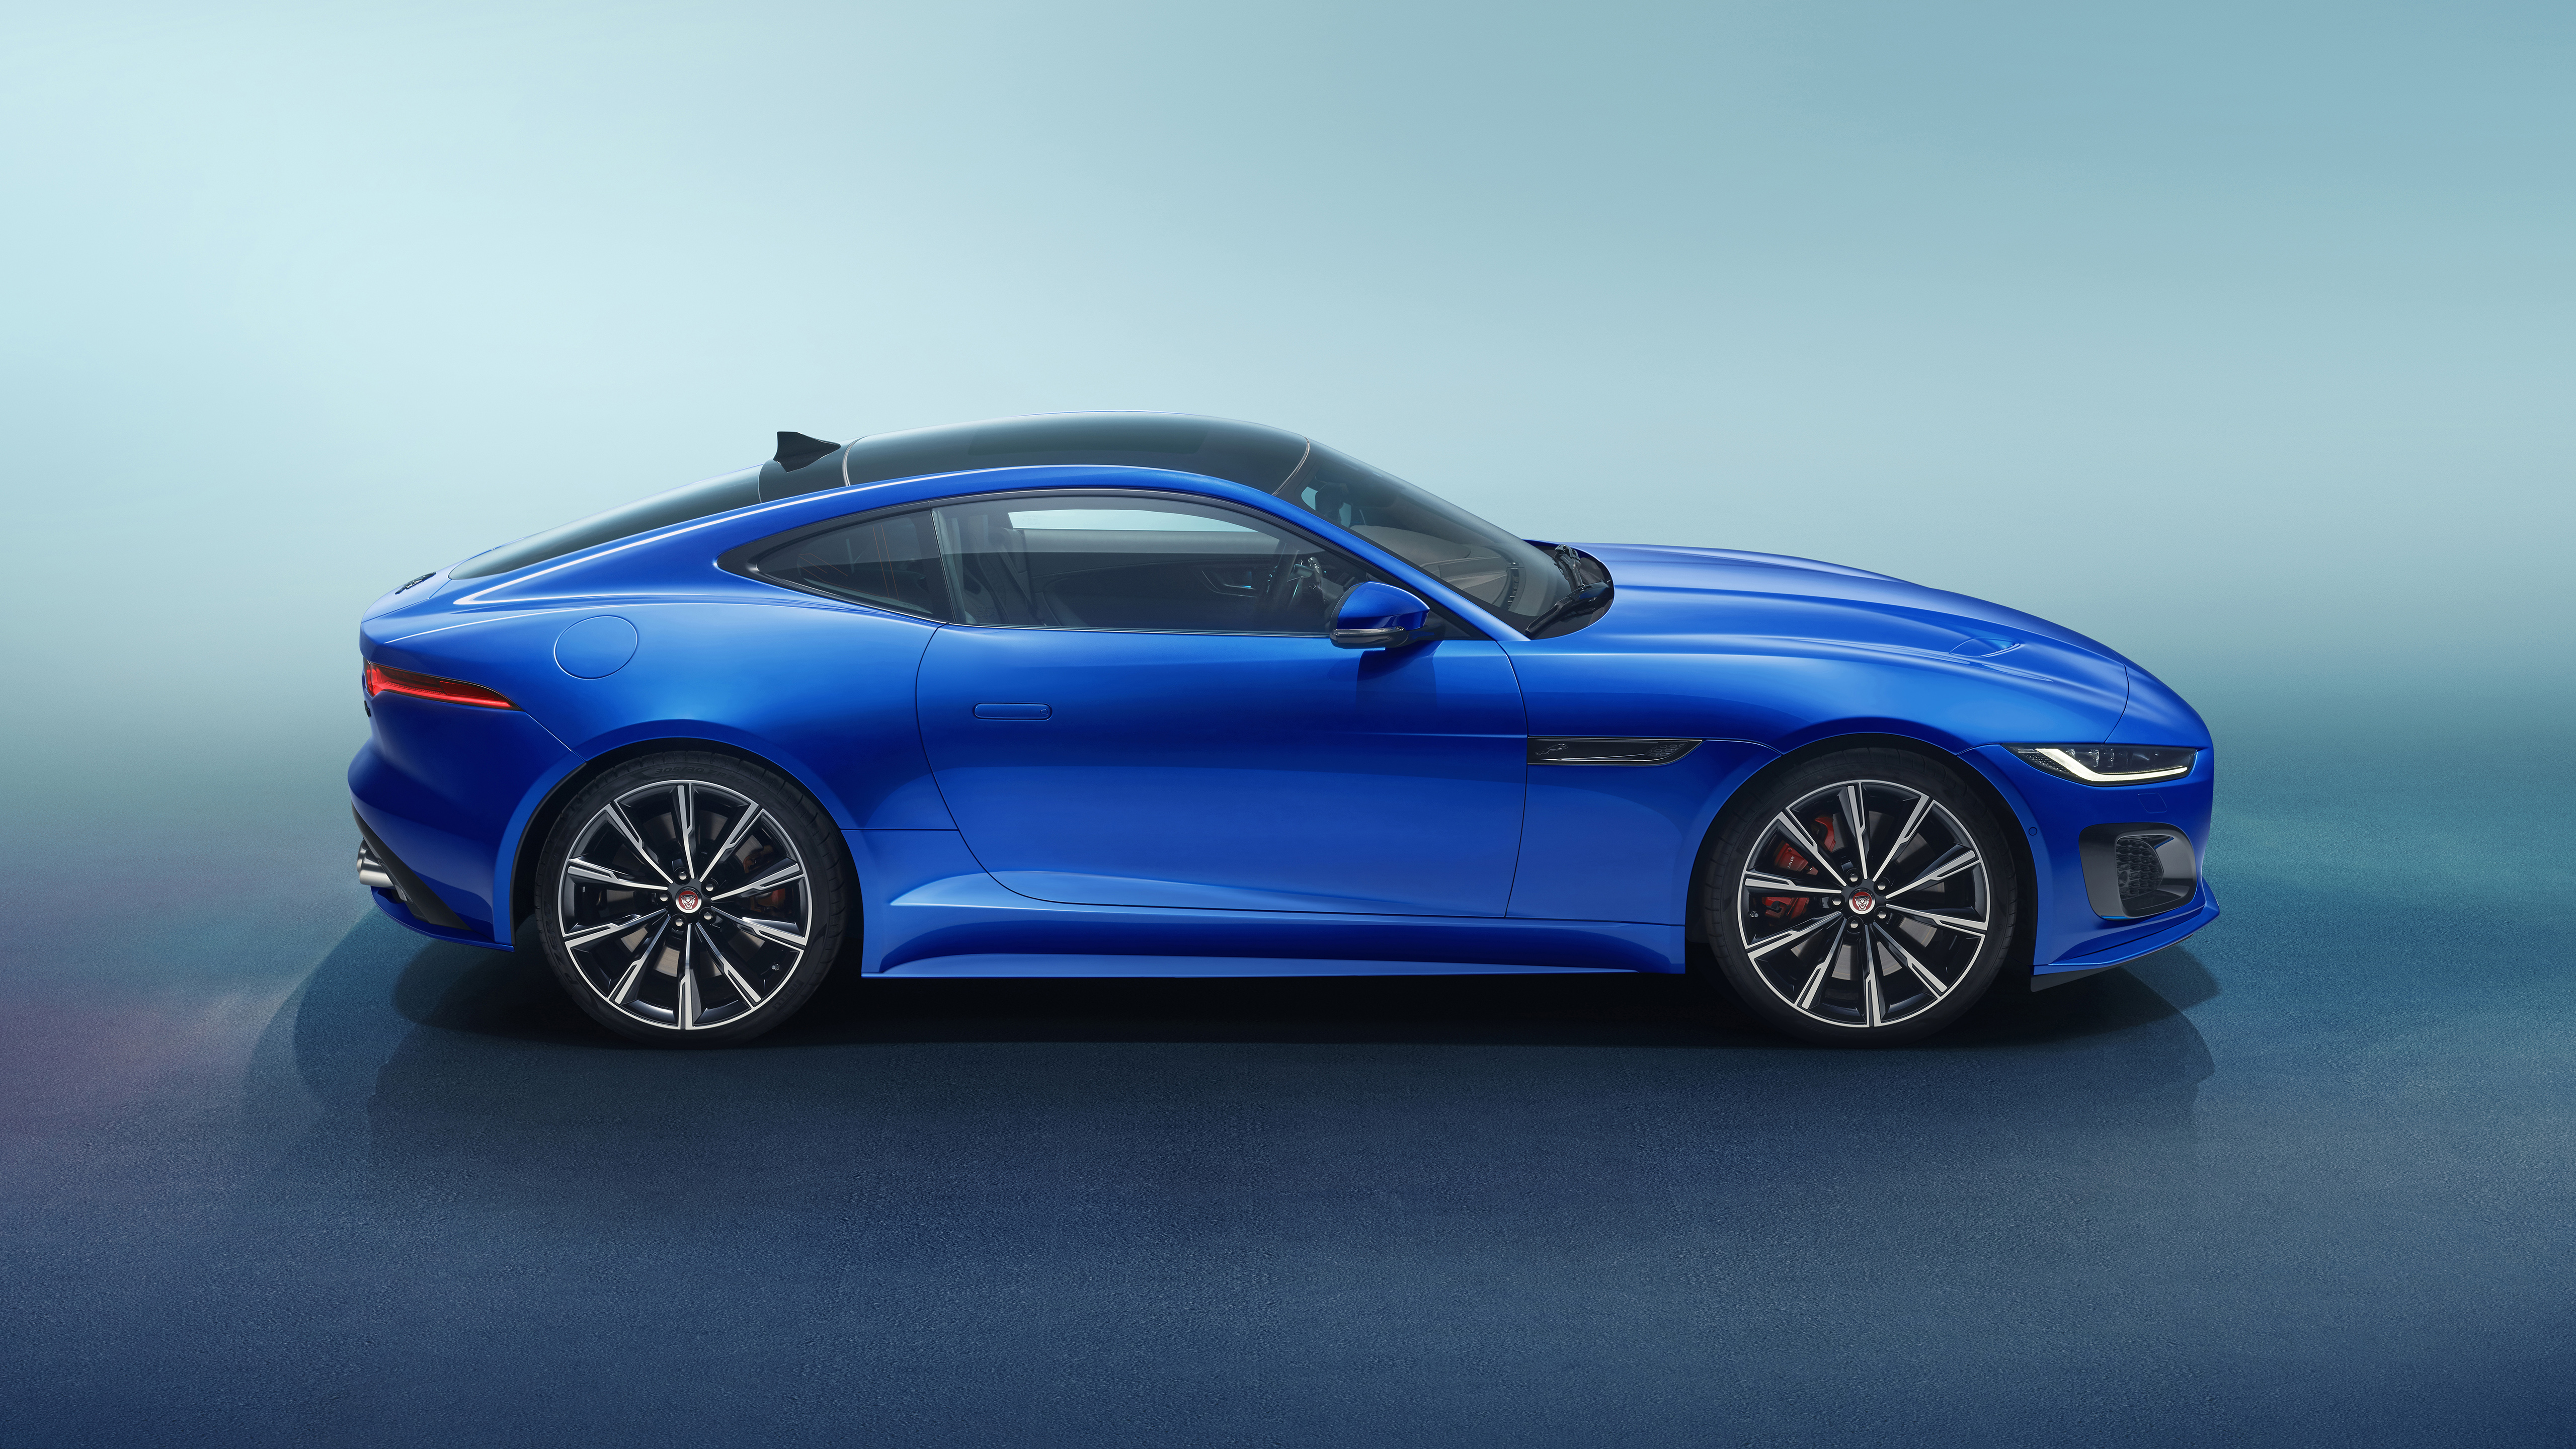 Jaguar F Type R Coupe 2020 4k 6 Wallpaper Hd Car Wallpapers Id 13909